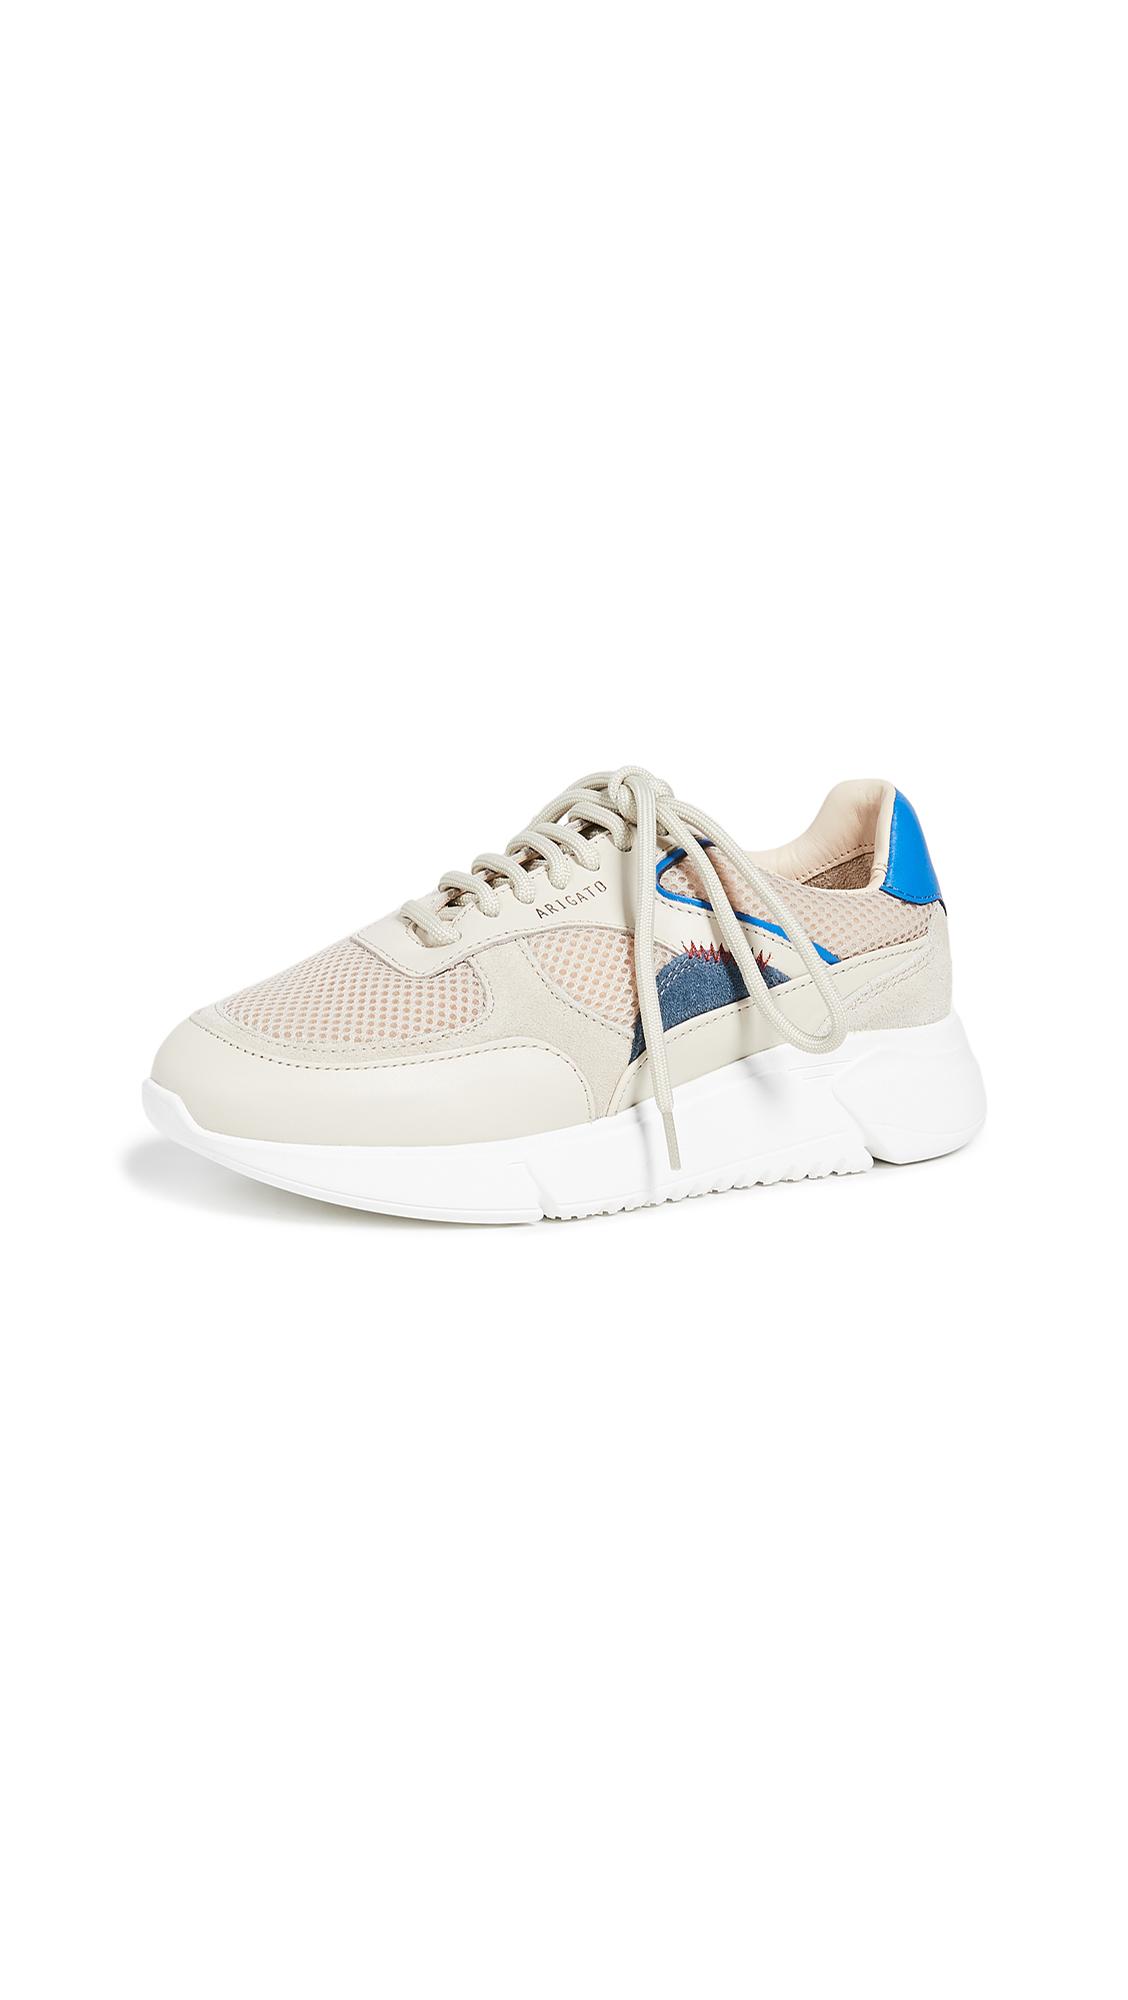 Axel Arigato Genesis Sneakers - Beige/Grey/Blue